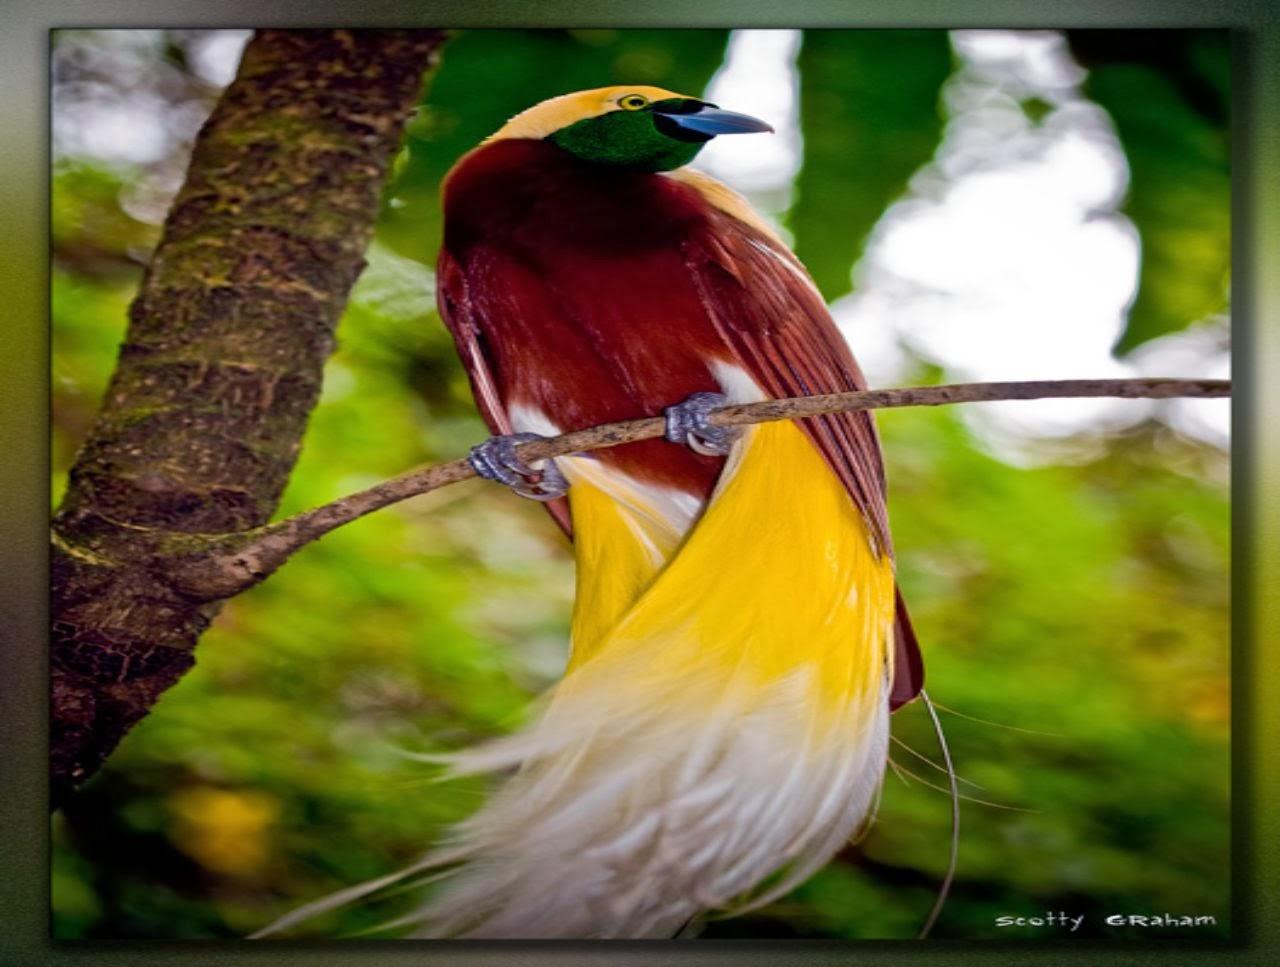 Bird of paradise wallpaper wallpapersafari - Hd images of birds of paradise ...